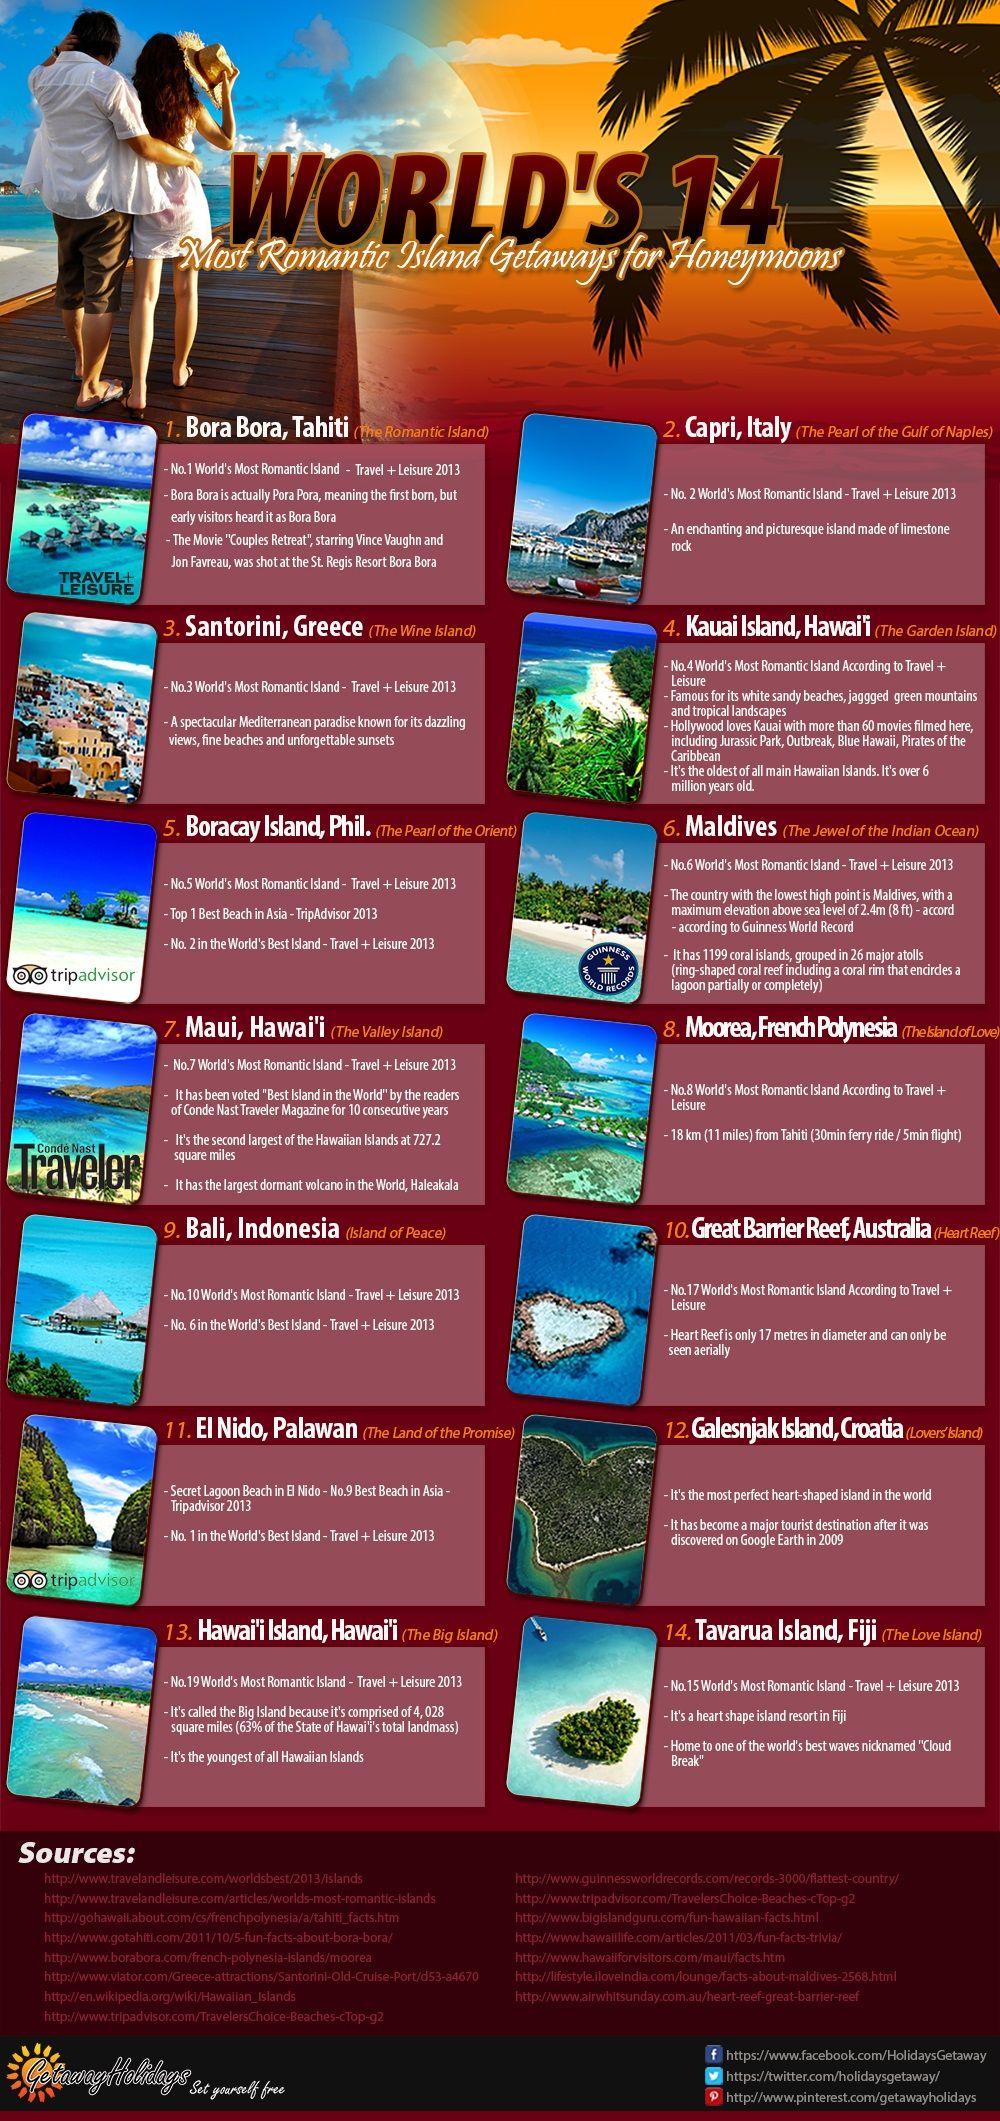 World's 14 Most Romantic Island Getaways For Honeymoons